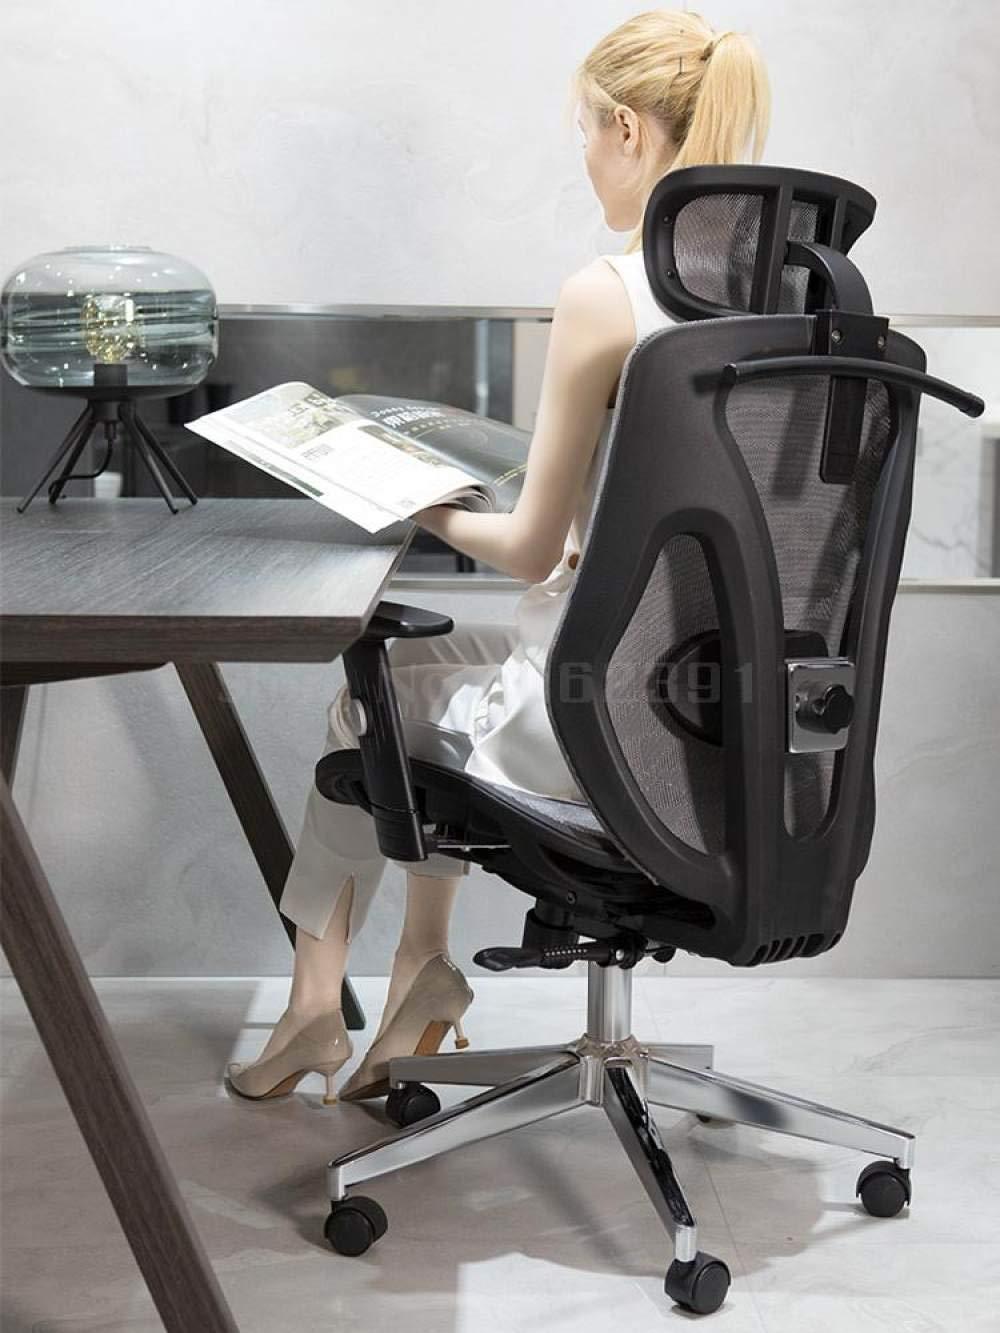 OPXZPM kontorsstol datorstol hem kontor stol chef stol midjeskydd roterande stol, 3 Same as Picture 3